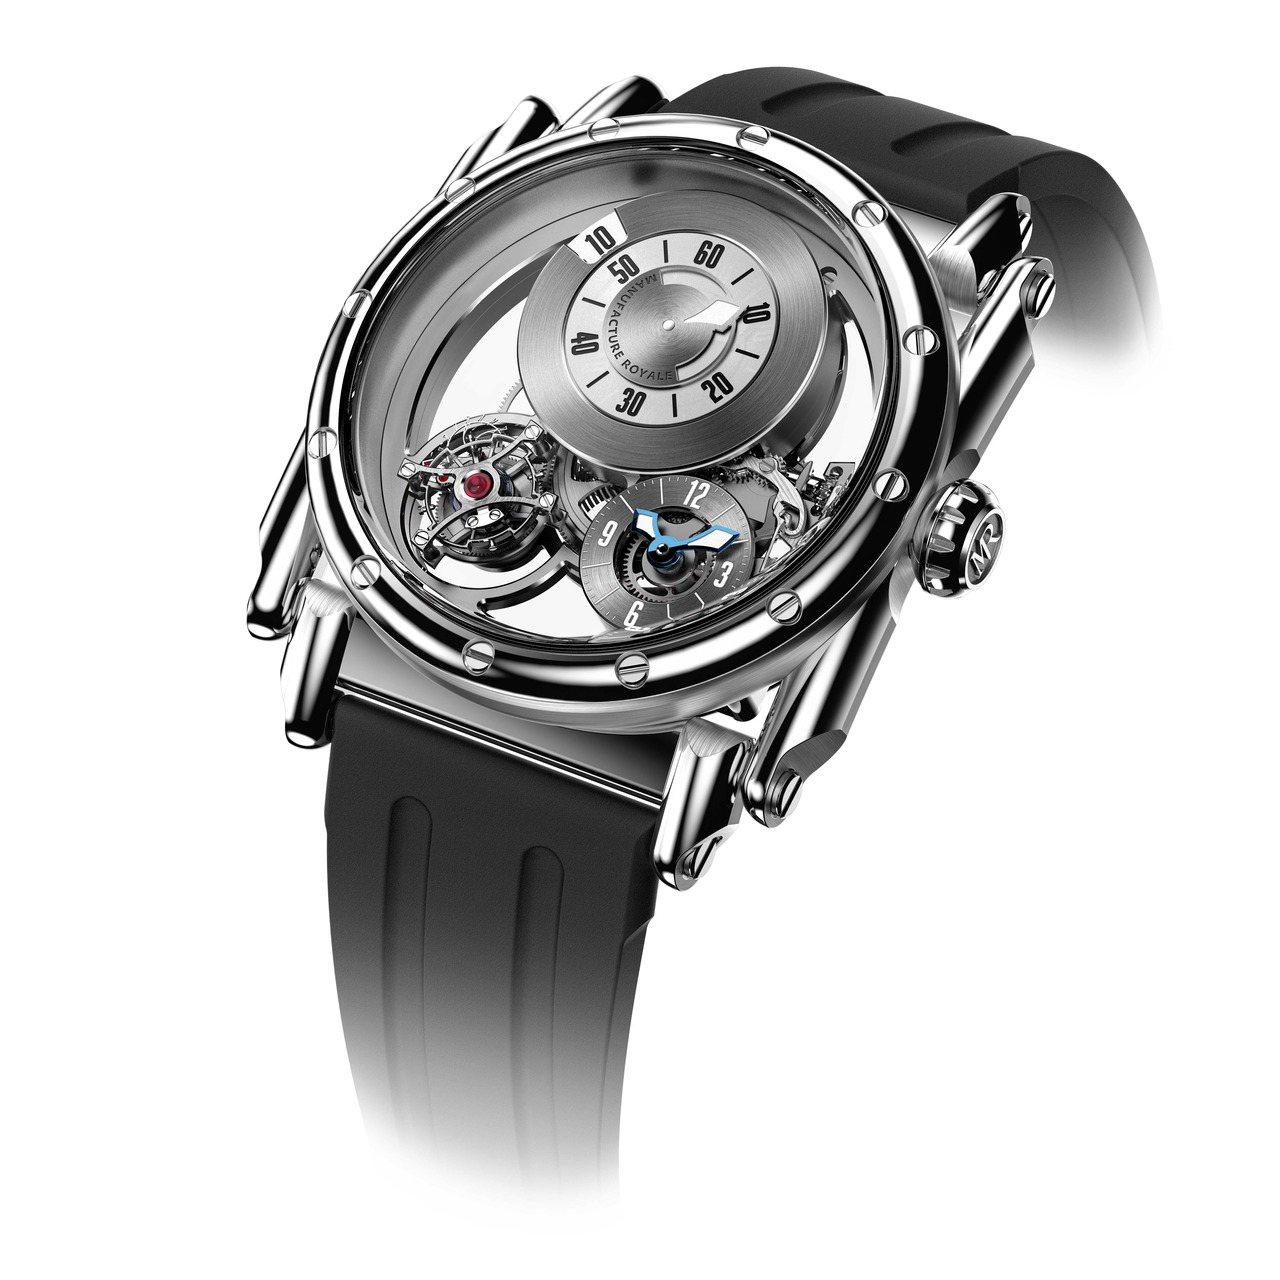 Manufacture Royale ADN腕表,跳時和連續分鐘顯示,獨立第二時...